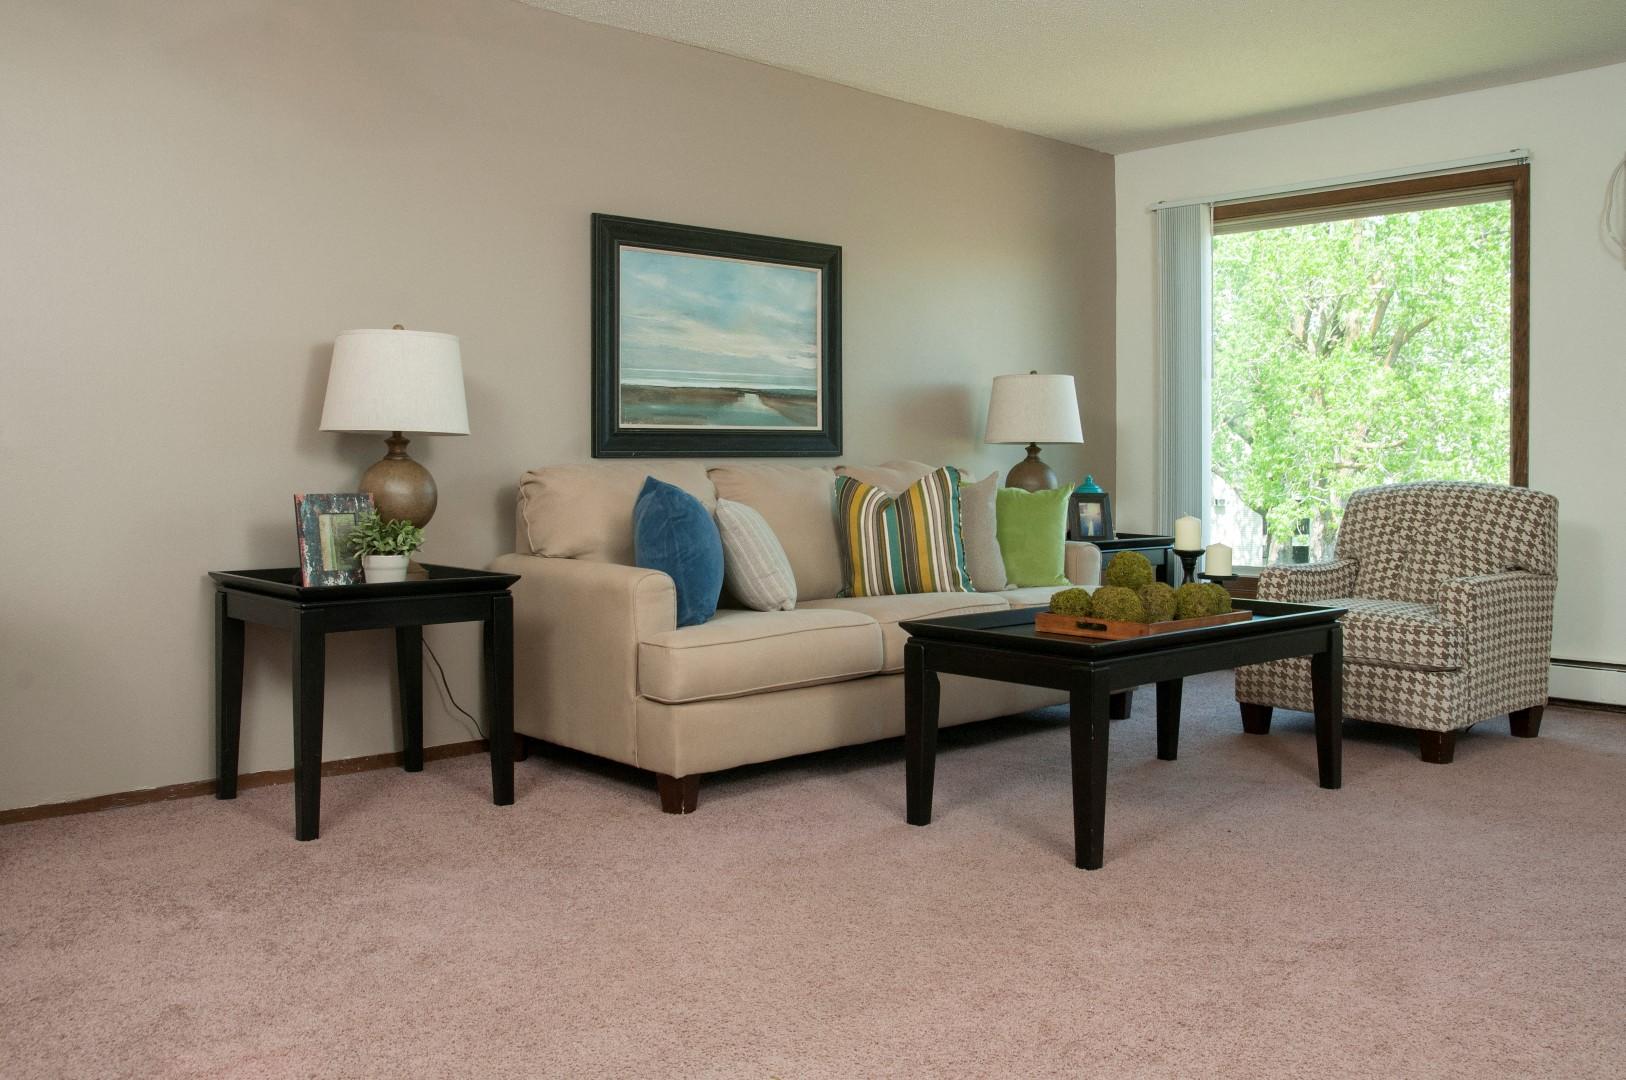 Bright Picture Windows At Hillsborough Apartments, Roseville, MN 55113